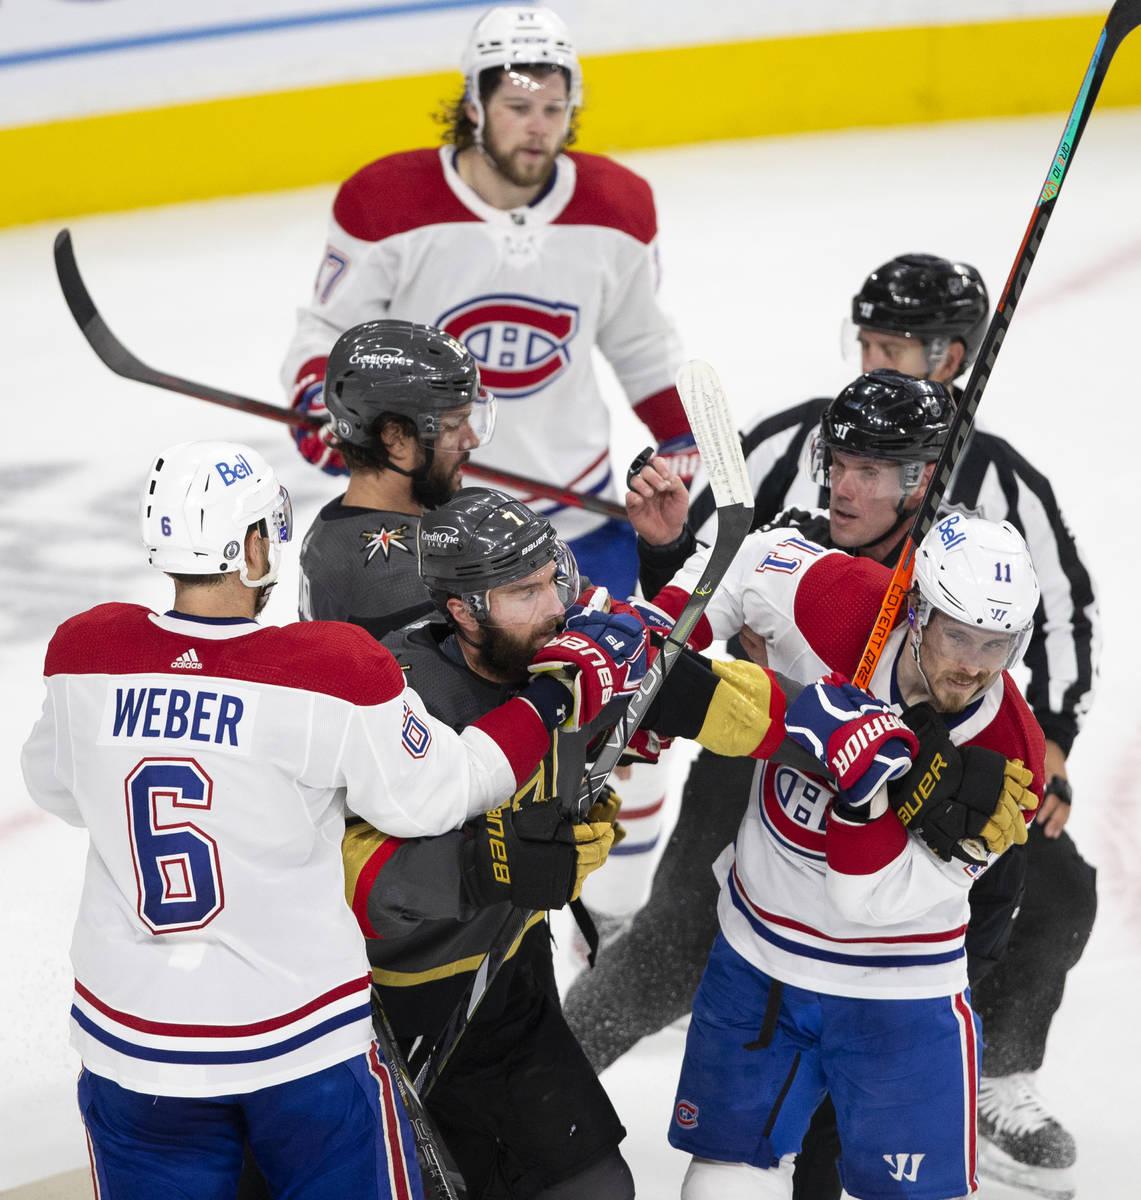 Golden Knights defenseman Alex Pietrangelo (7) and Canadiens right wing Brendan Gallagher (11) ...